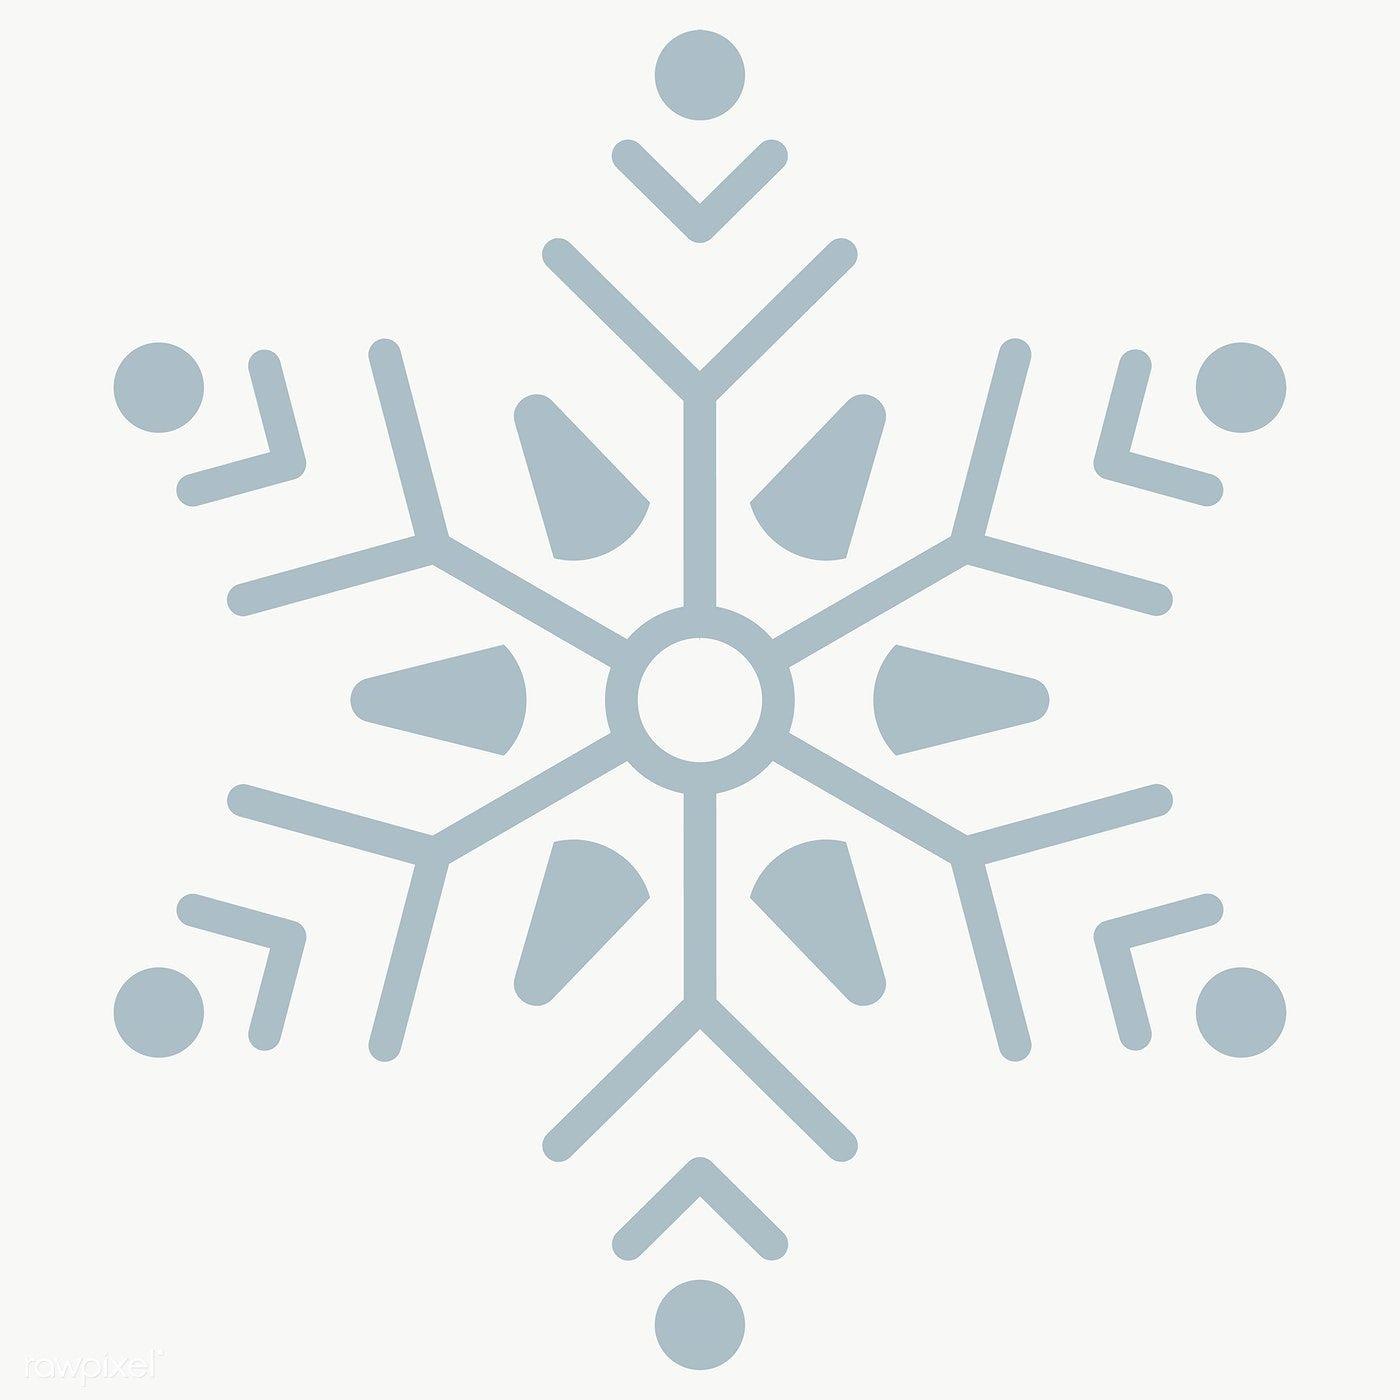 Christmas Snowflake Social Ads Template Transparent Png Premium Image By Rawpixel Com Sasi Christmas Snowflakes Snowflakes Social Ads